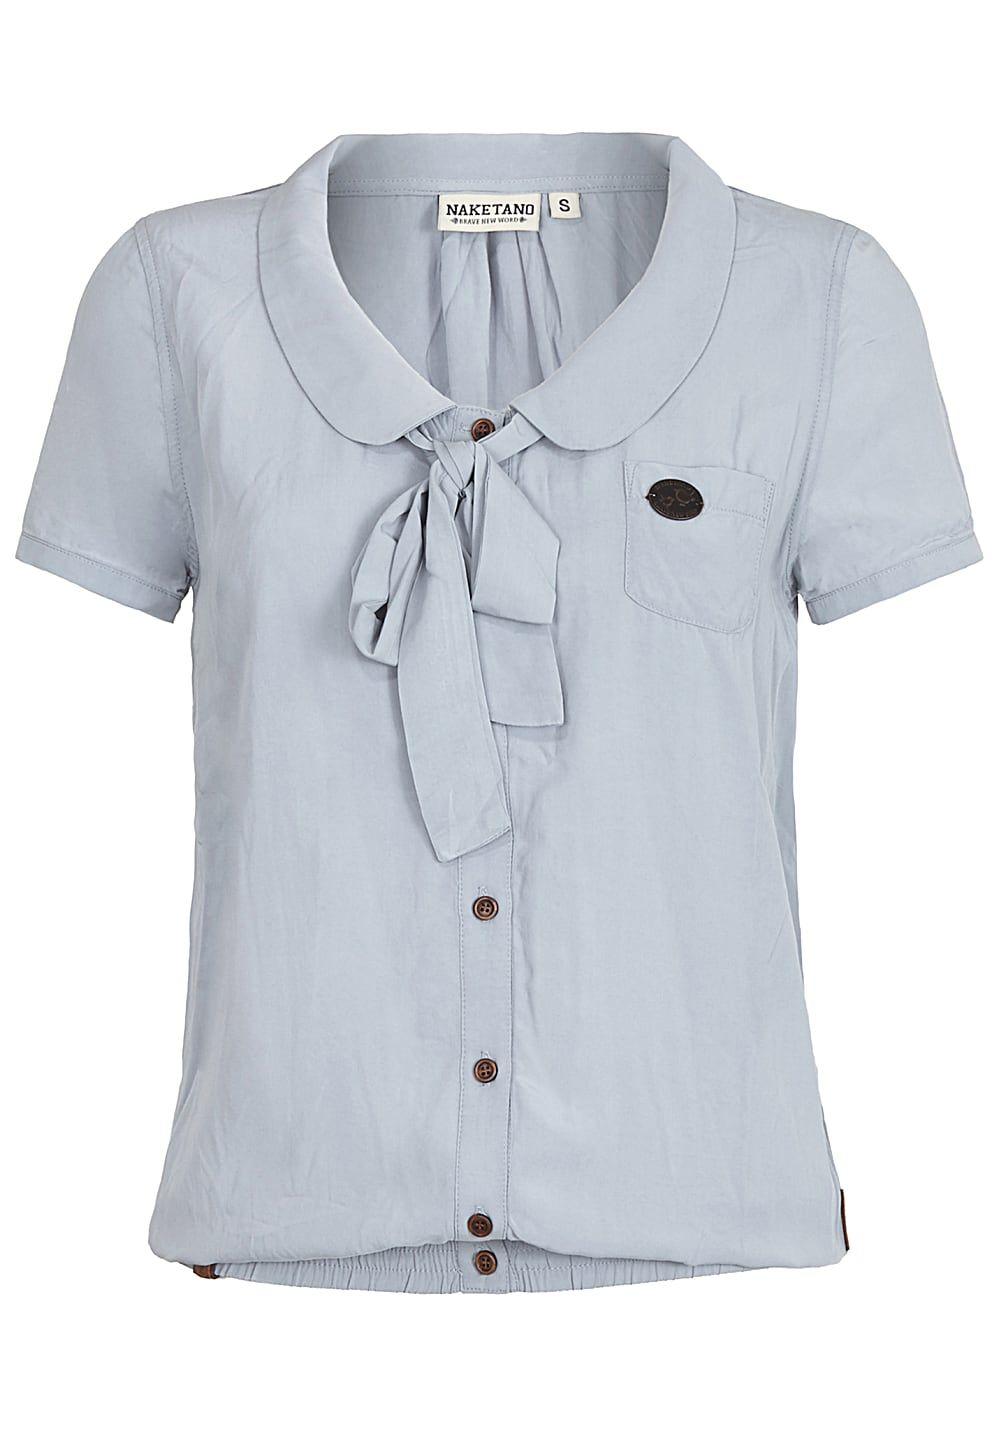 brand new ba0d6 95f13 NAKETANO Kurz Kacken III - Bluse für Damen - Blau - jetzt ...